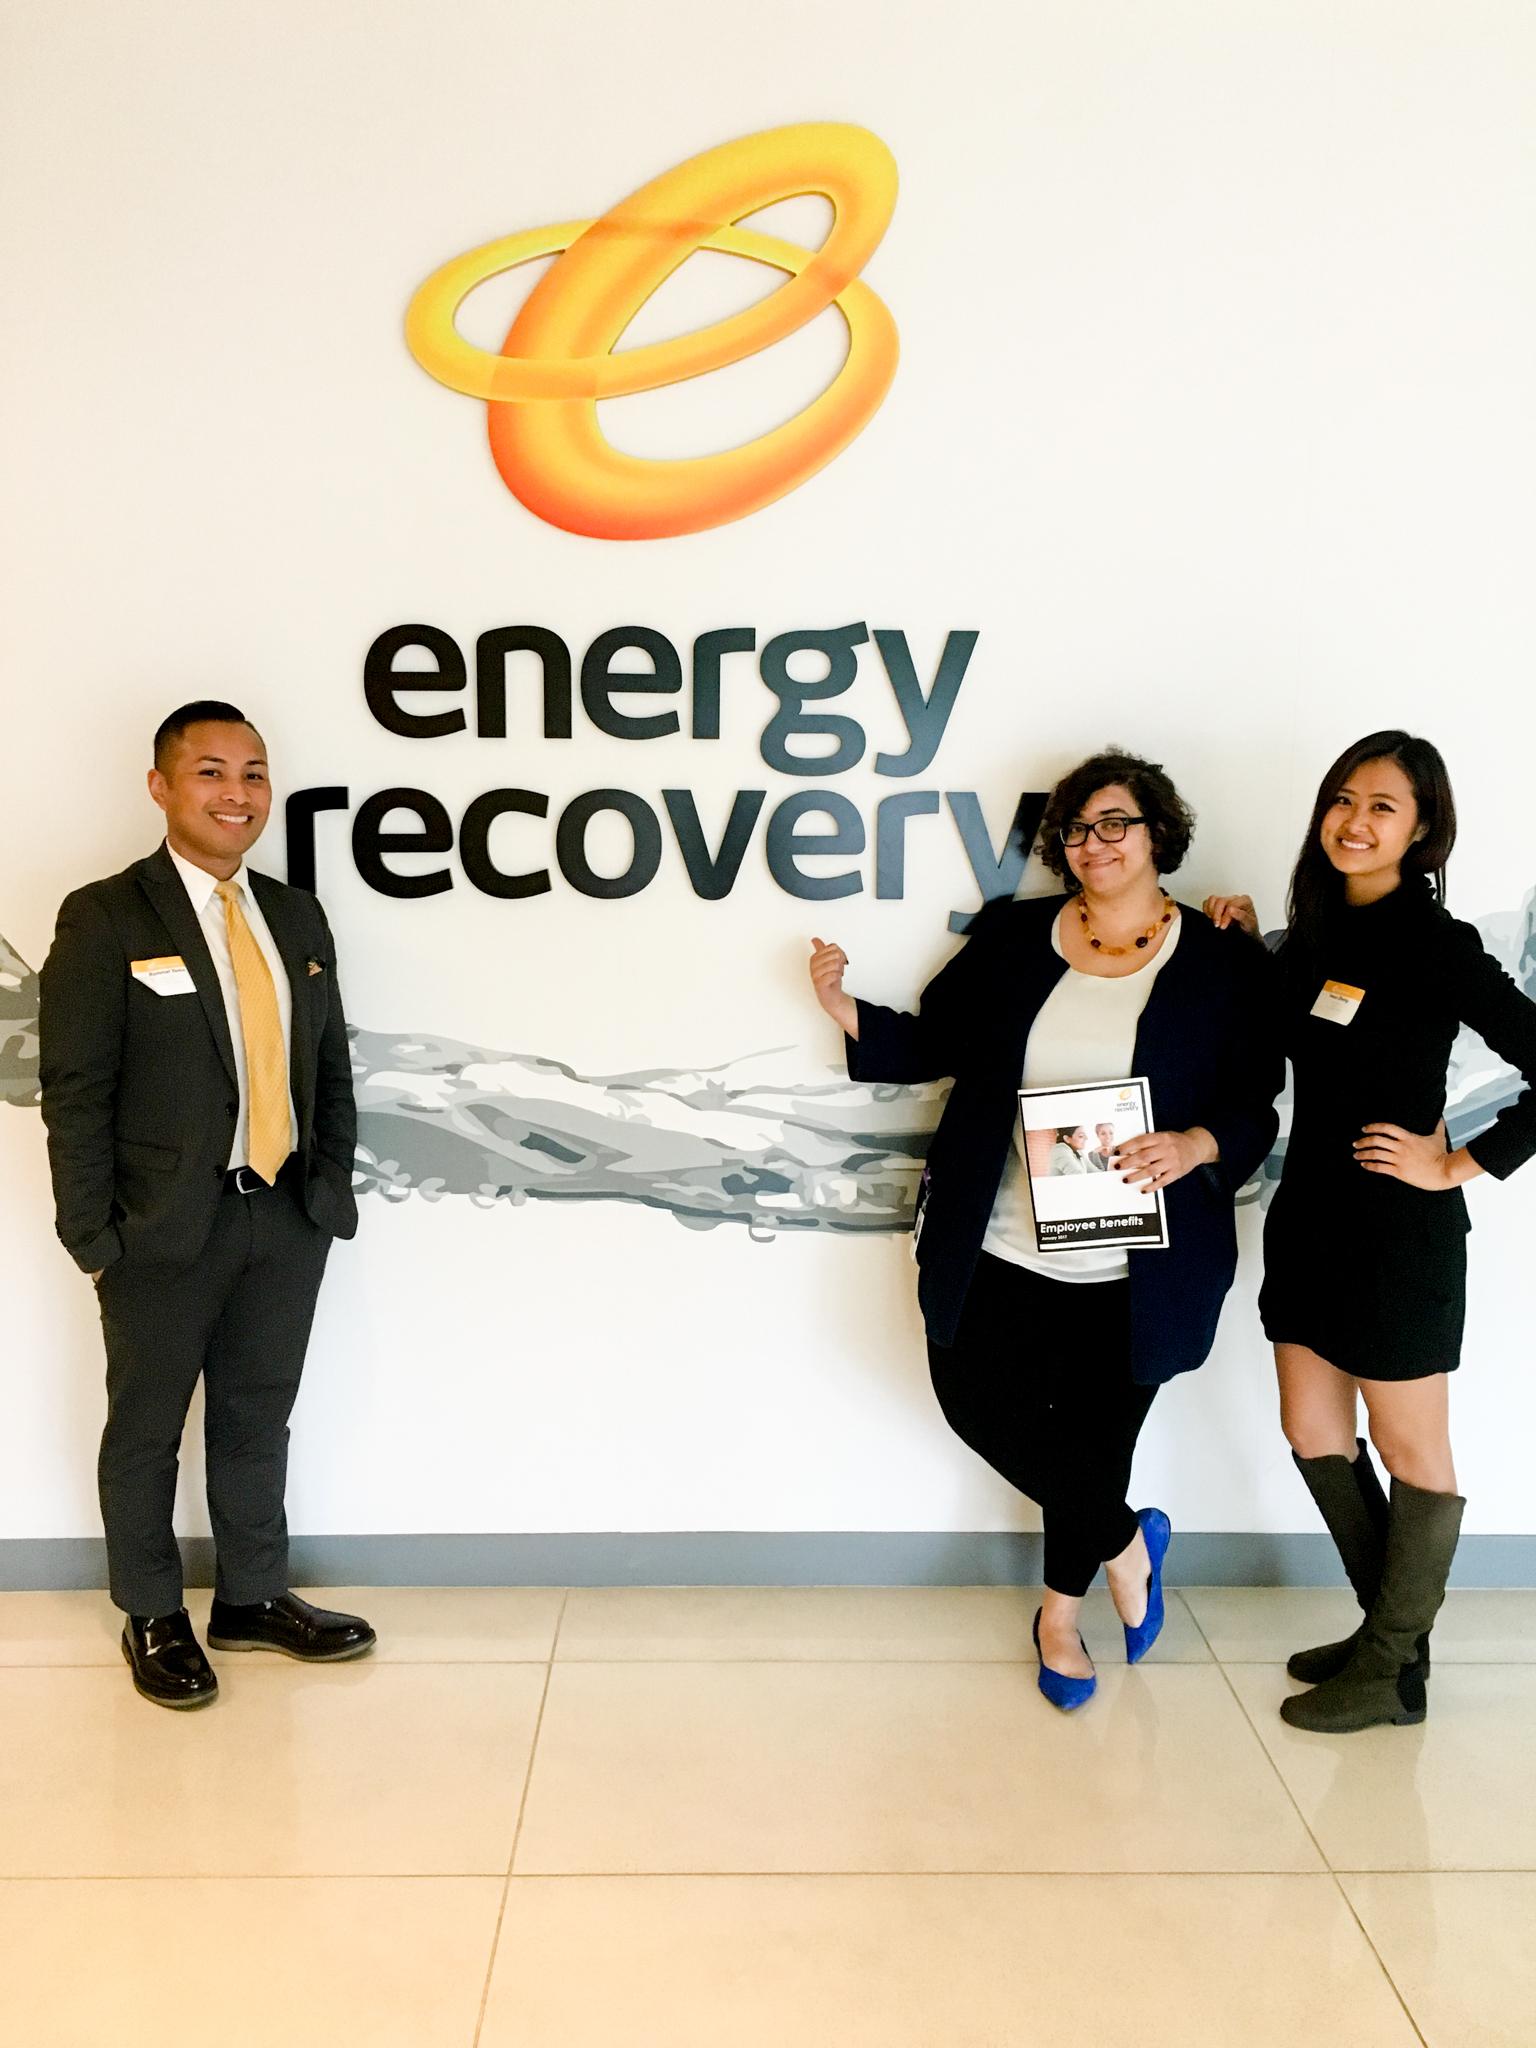 Rommel Yema, Rose Nemet, Venus Zheng posing in front of Energy Recovery logo